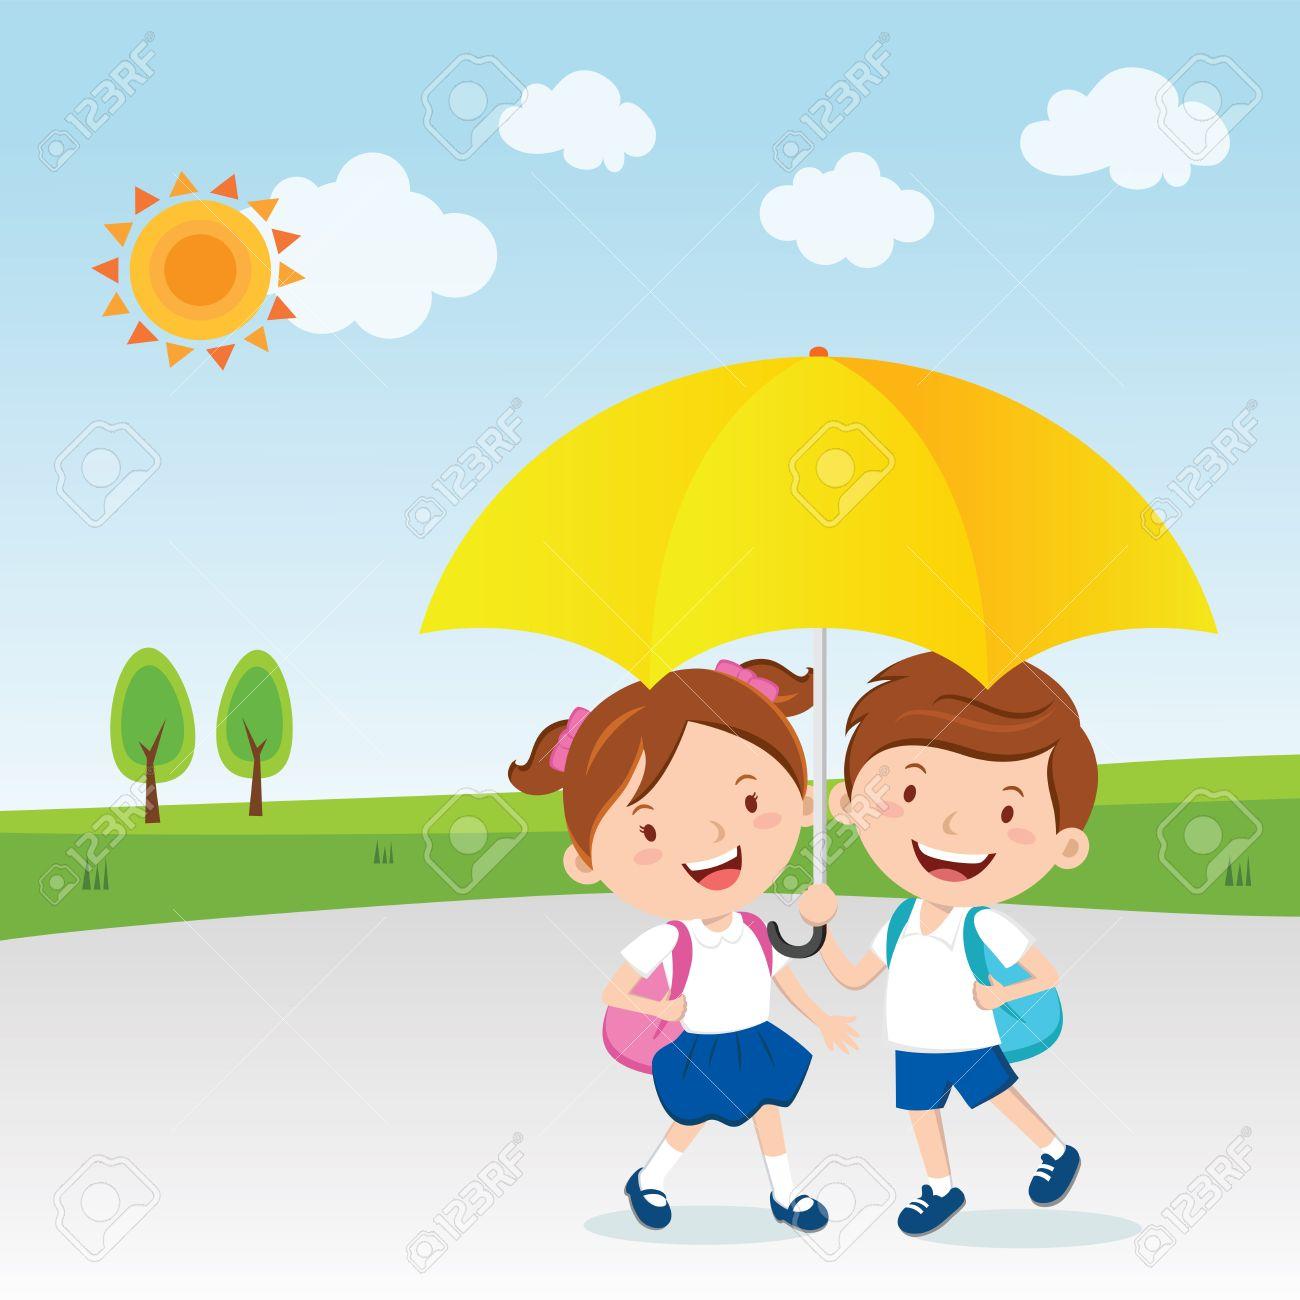 children under the umbrella sunny day royalty free cliparts rh 123rf com bright sunny day clipart sunny day clipart free